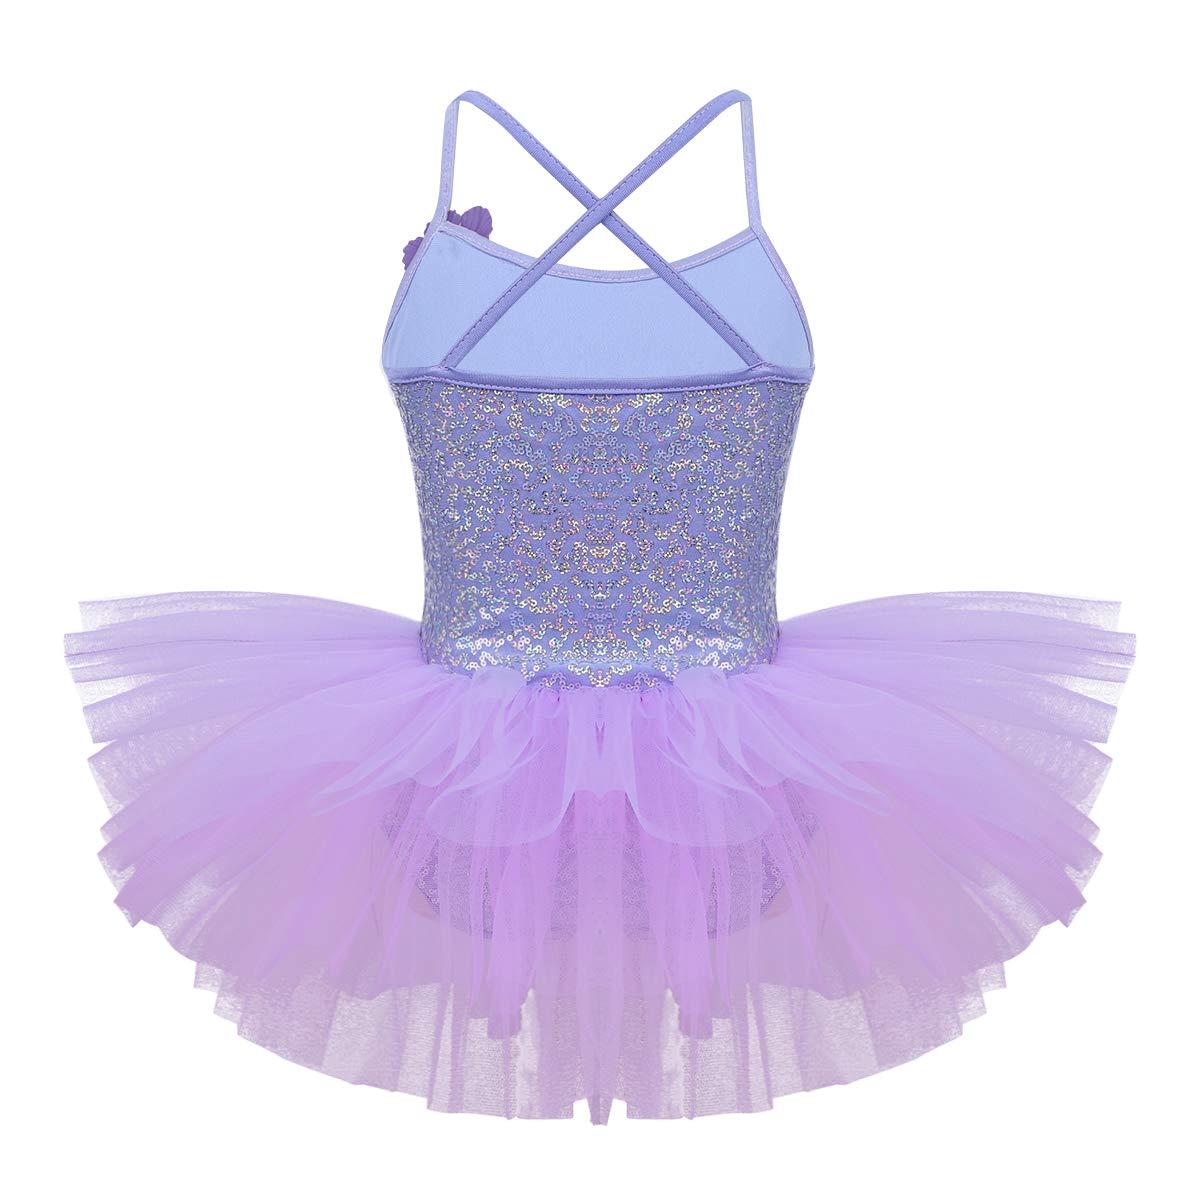 bbf2c9171 iEFiEL Kids Girls  Sequins Ballet Tutu Dress Gymnastic Leotard ...